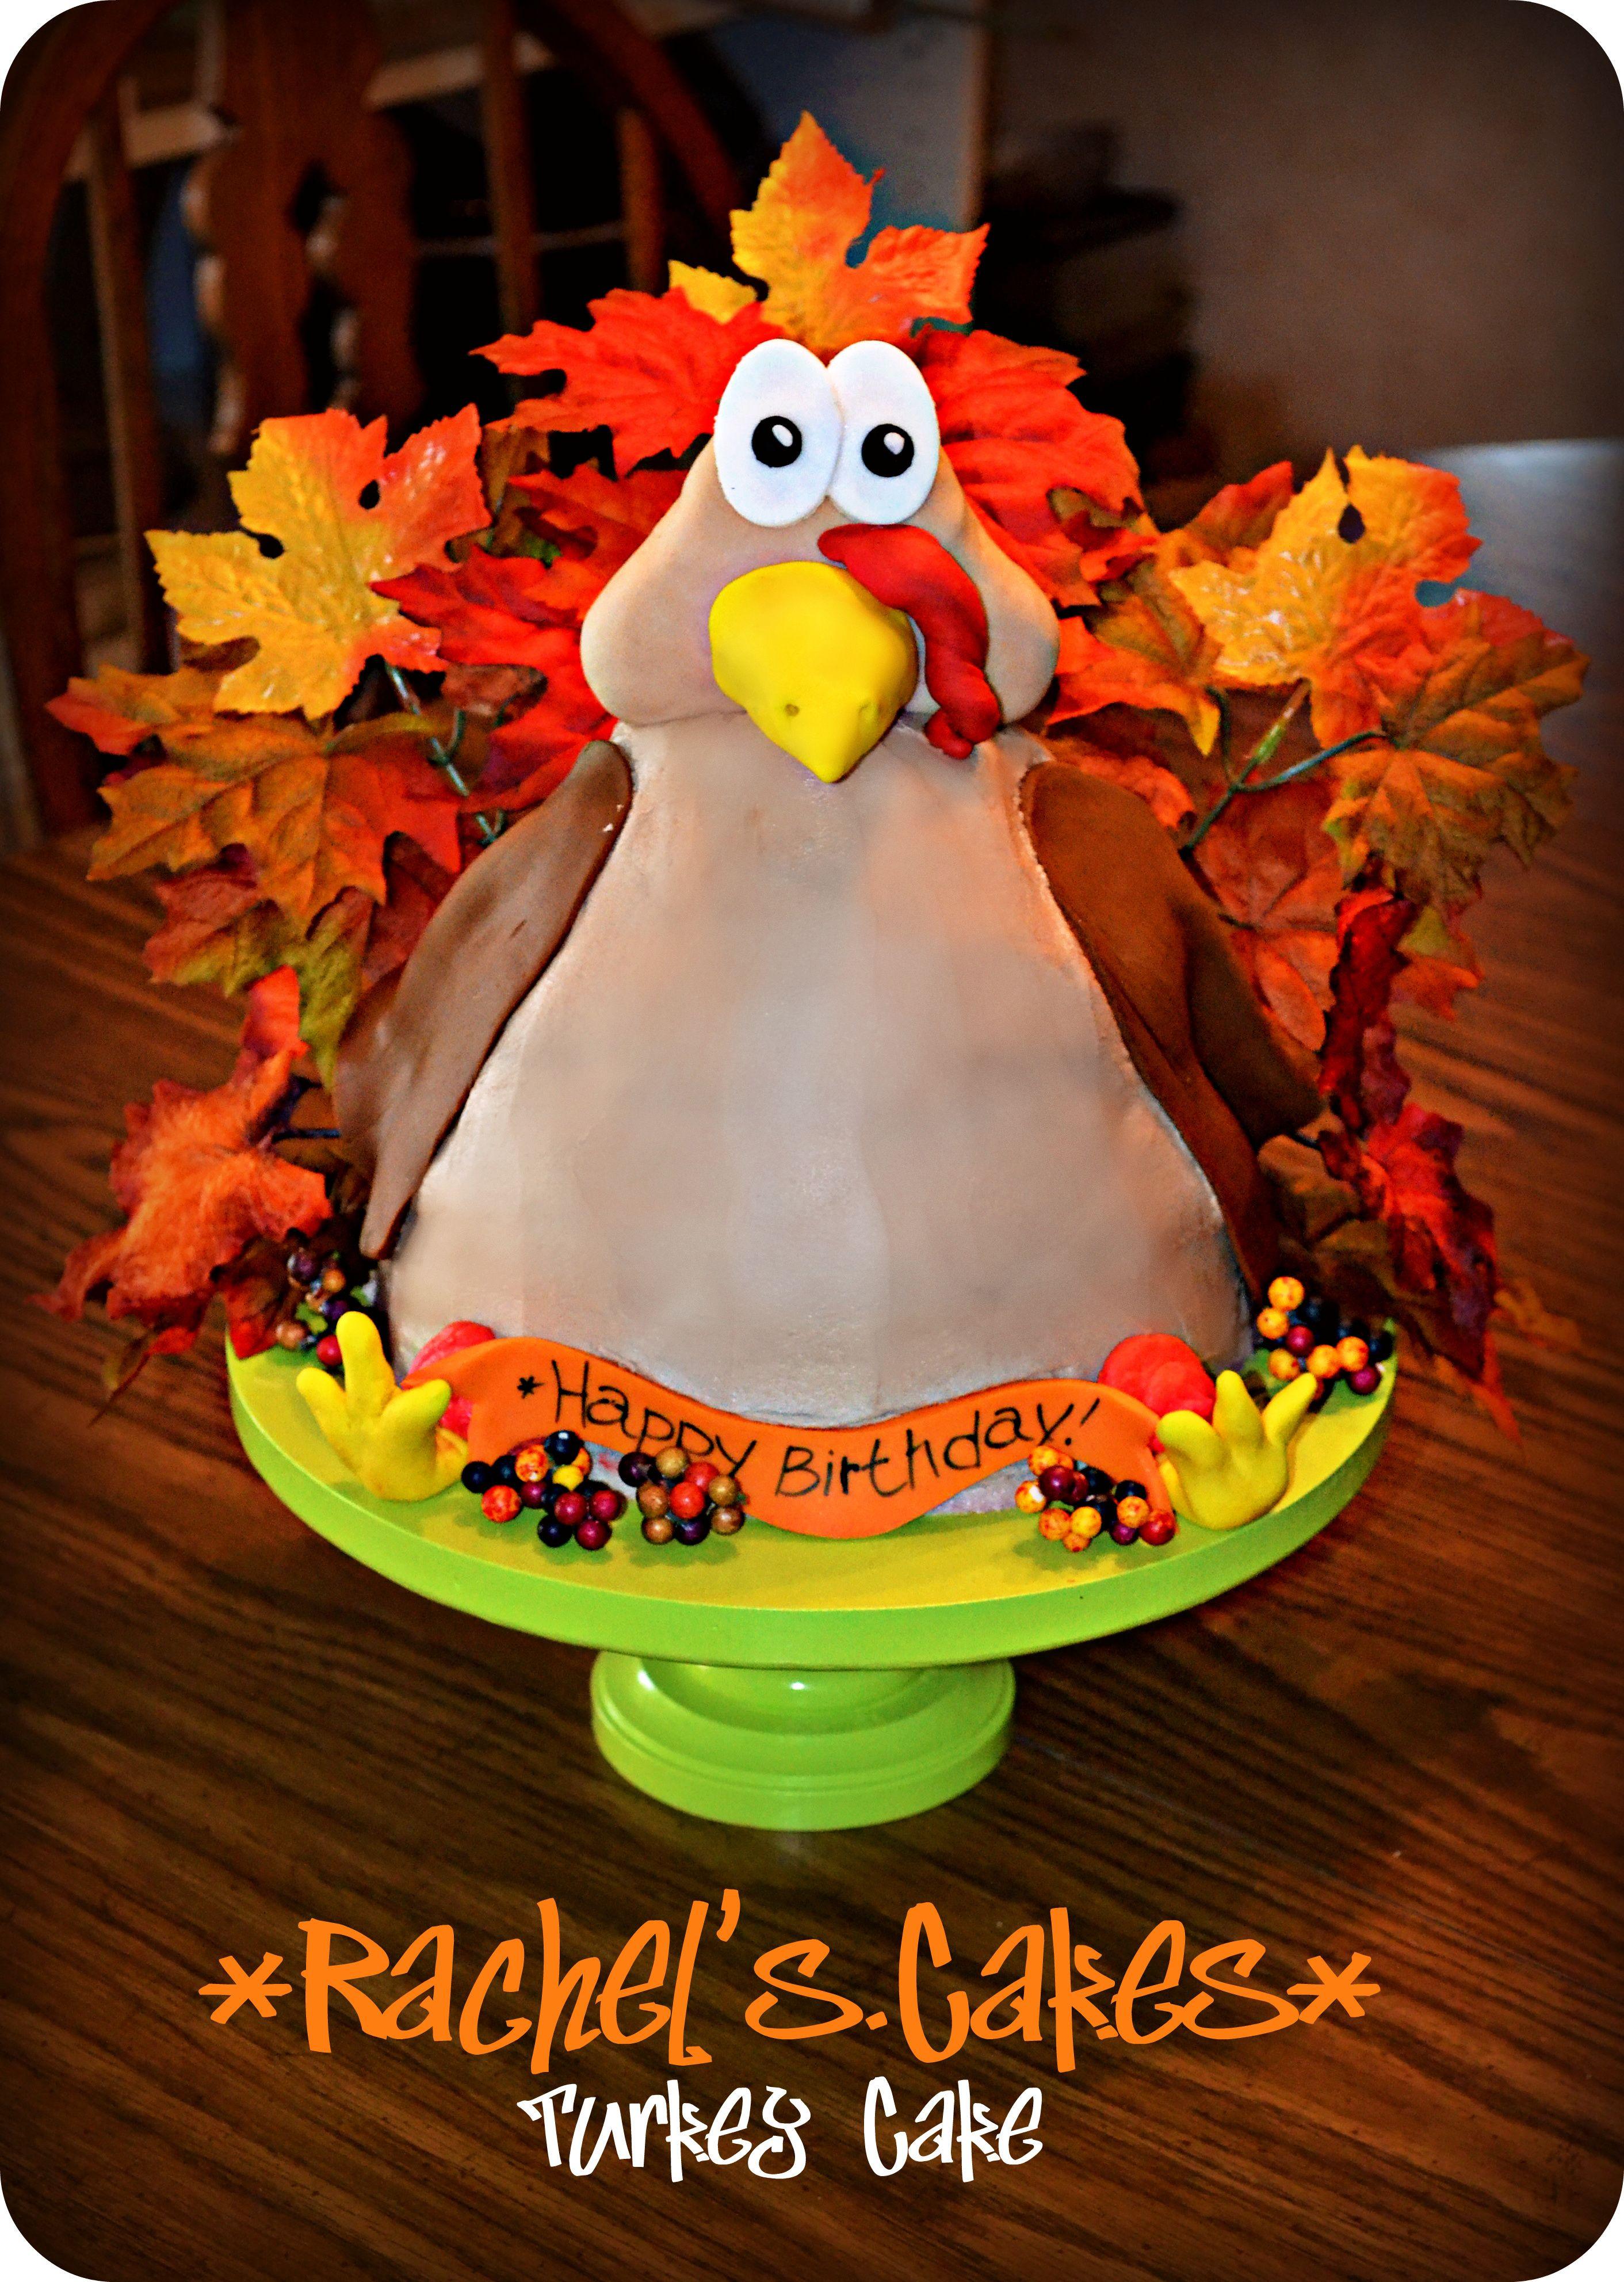 Thanksgiving Birthday Cake  Turkey Cake Perfect for November Birthdays or